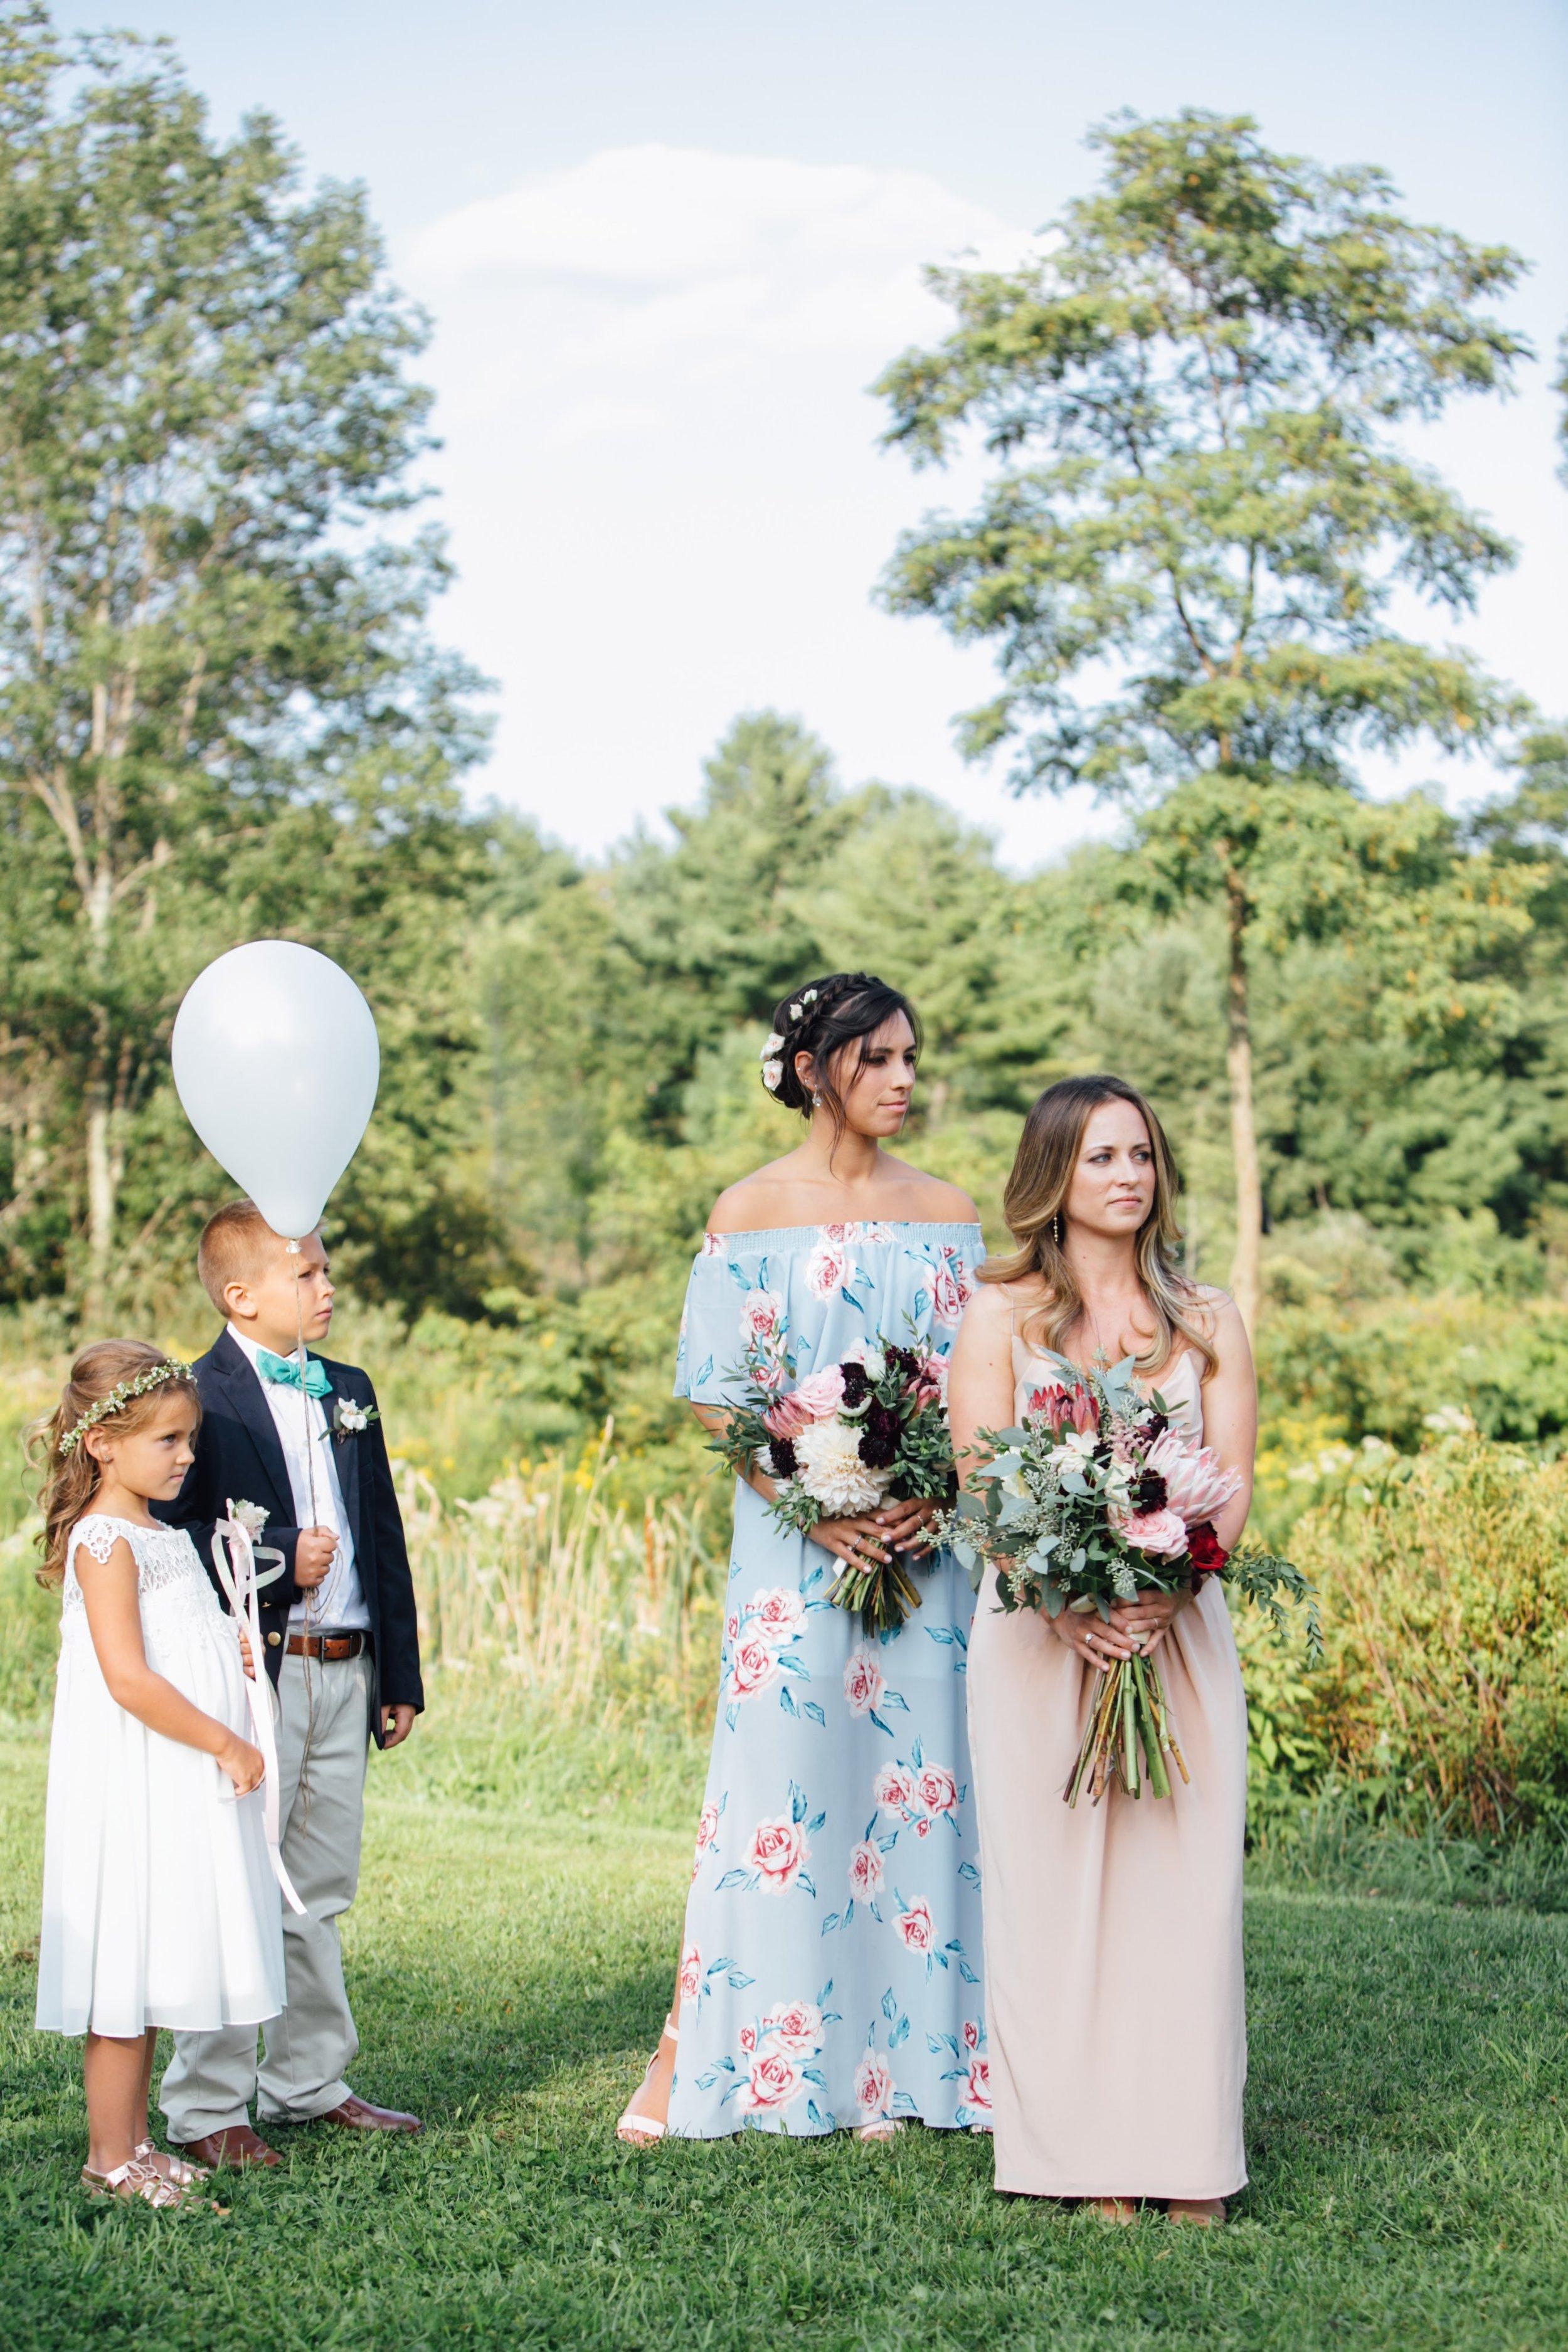 Courtney + Matt Blenheim Hill Farm Catskills NY Wedding Veronica Lola Photography 2017-389.jpg